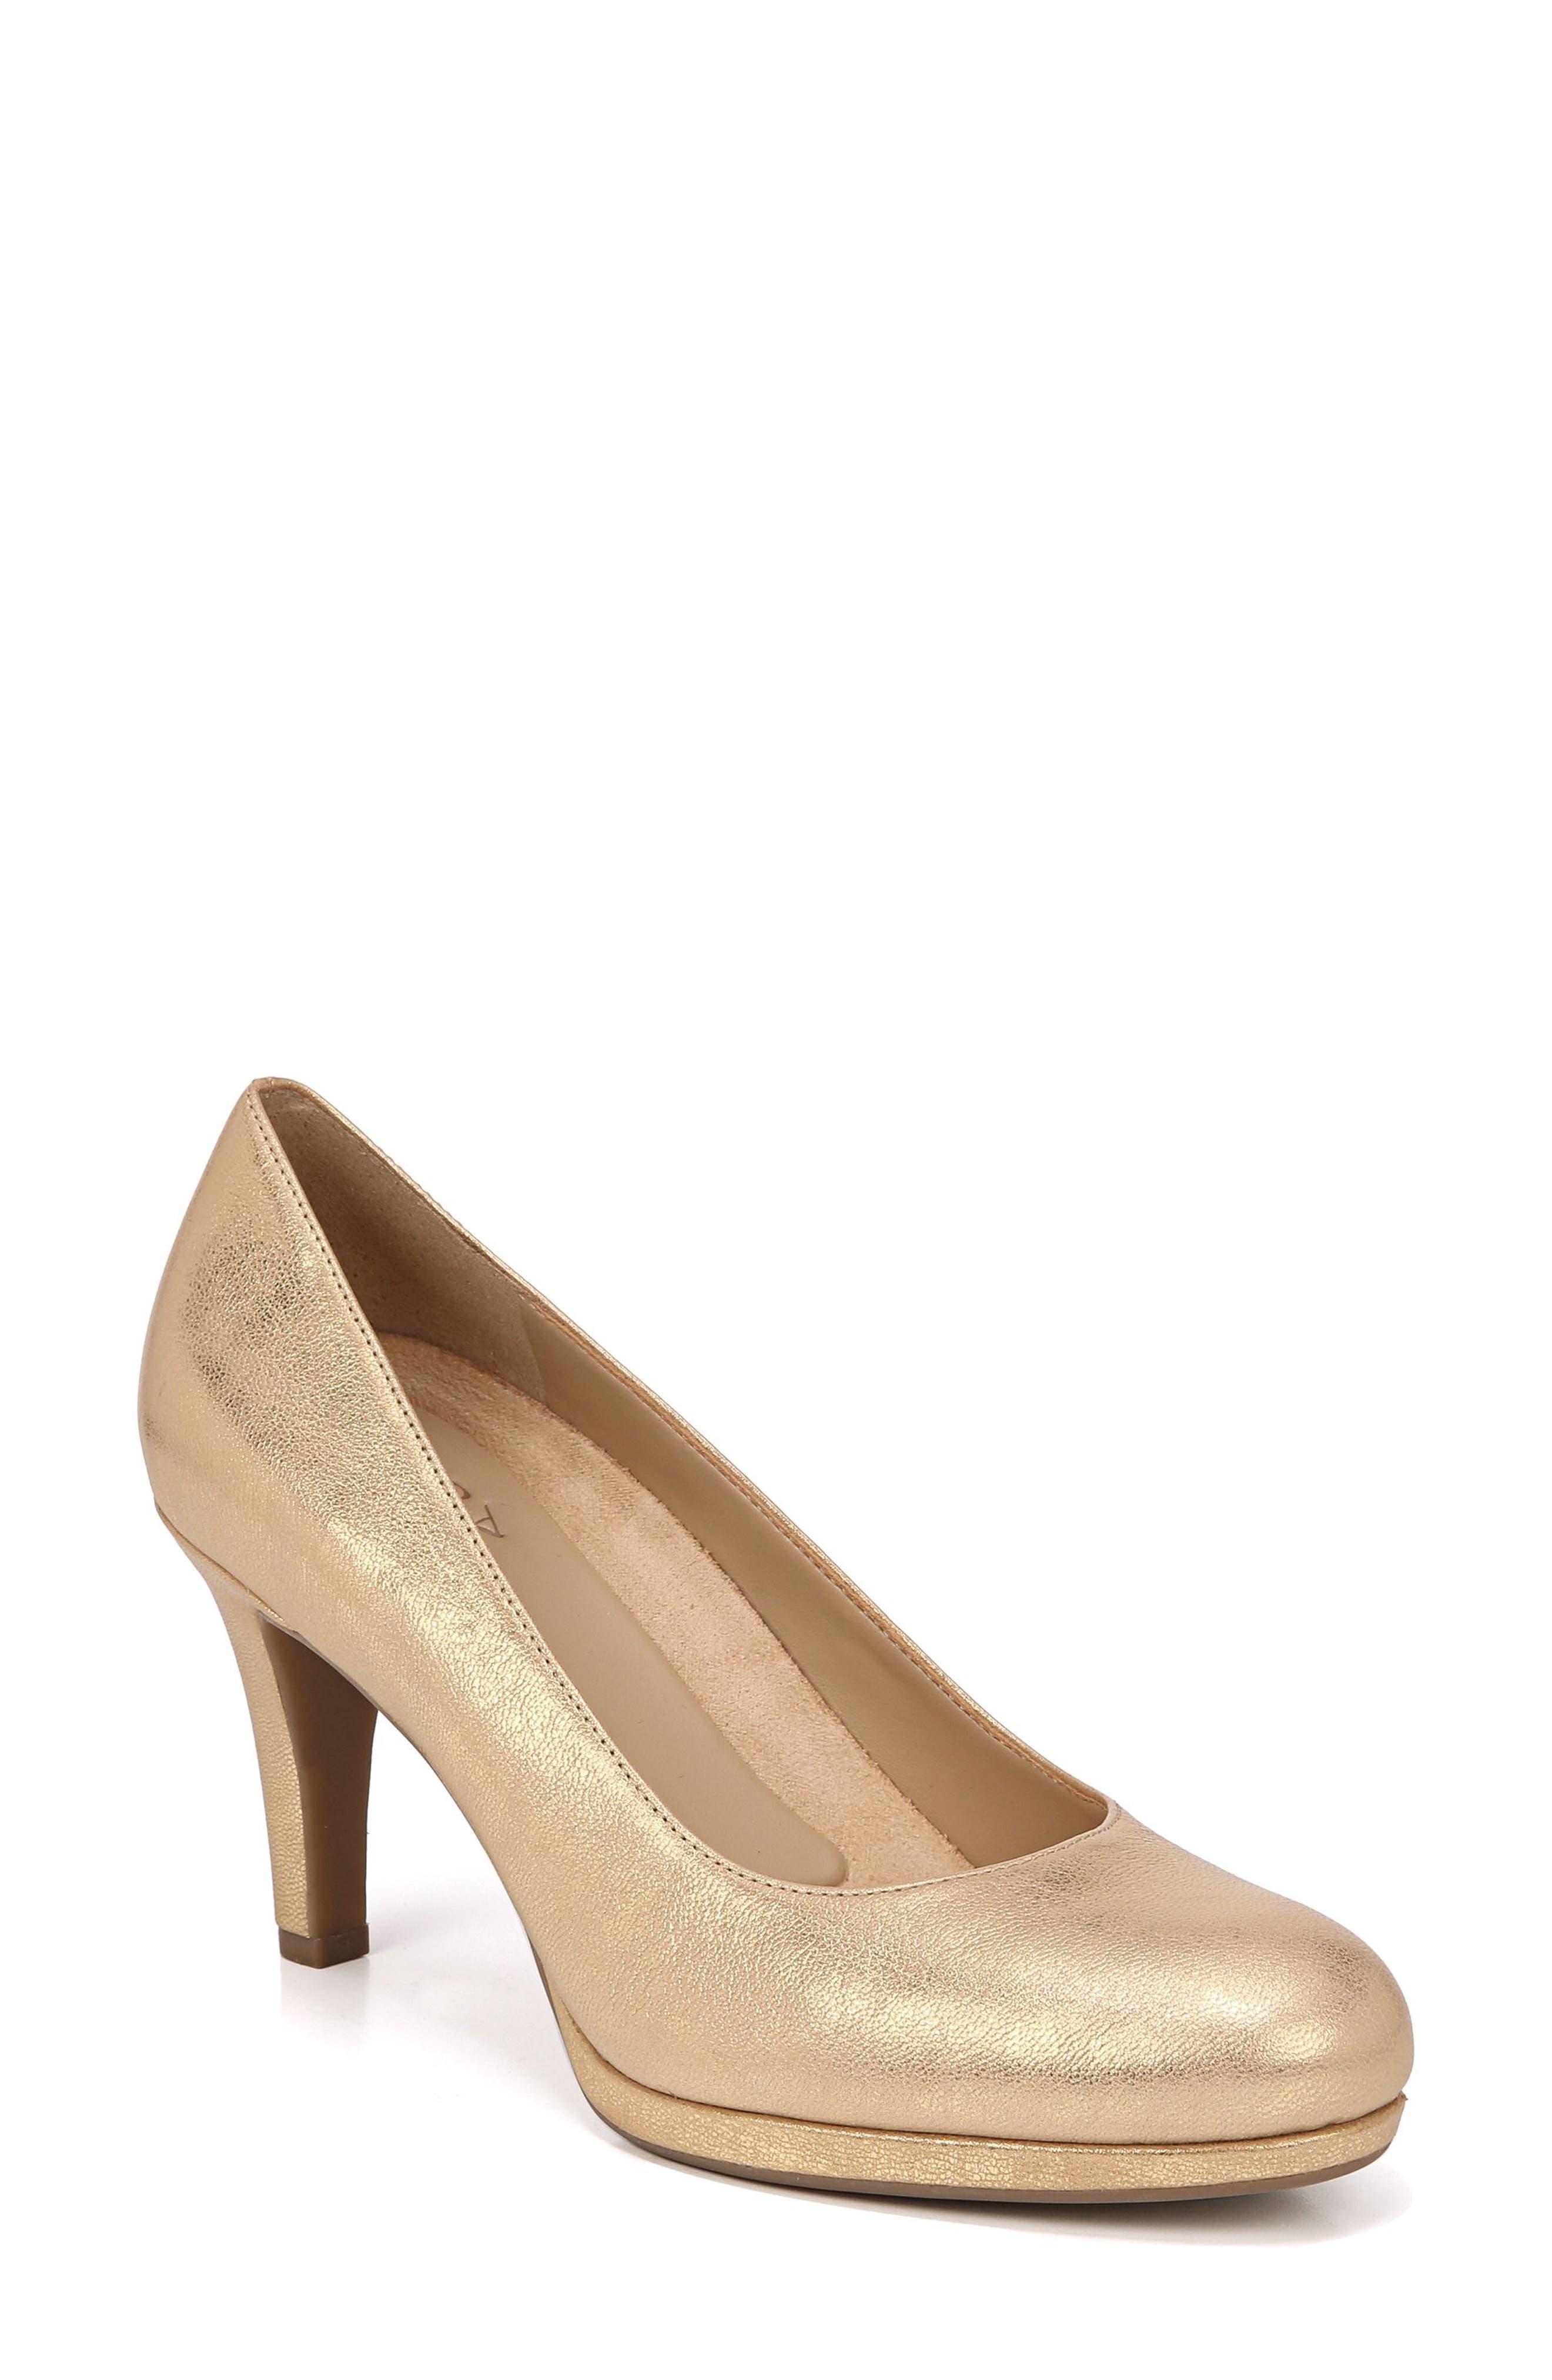 NATURALIZER 'Michelle' Almond Toe Pump, Main, color, GOLD LEATHER